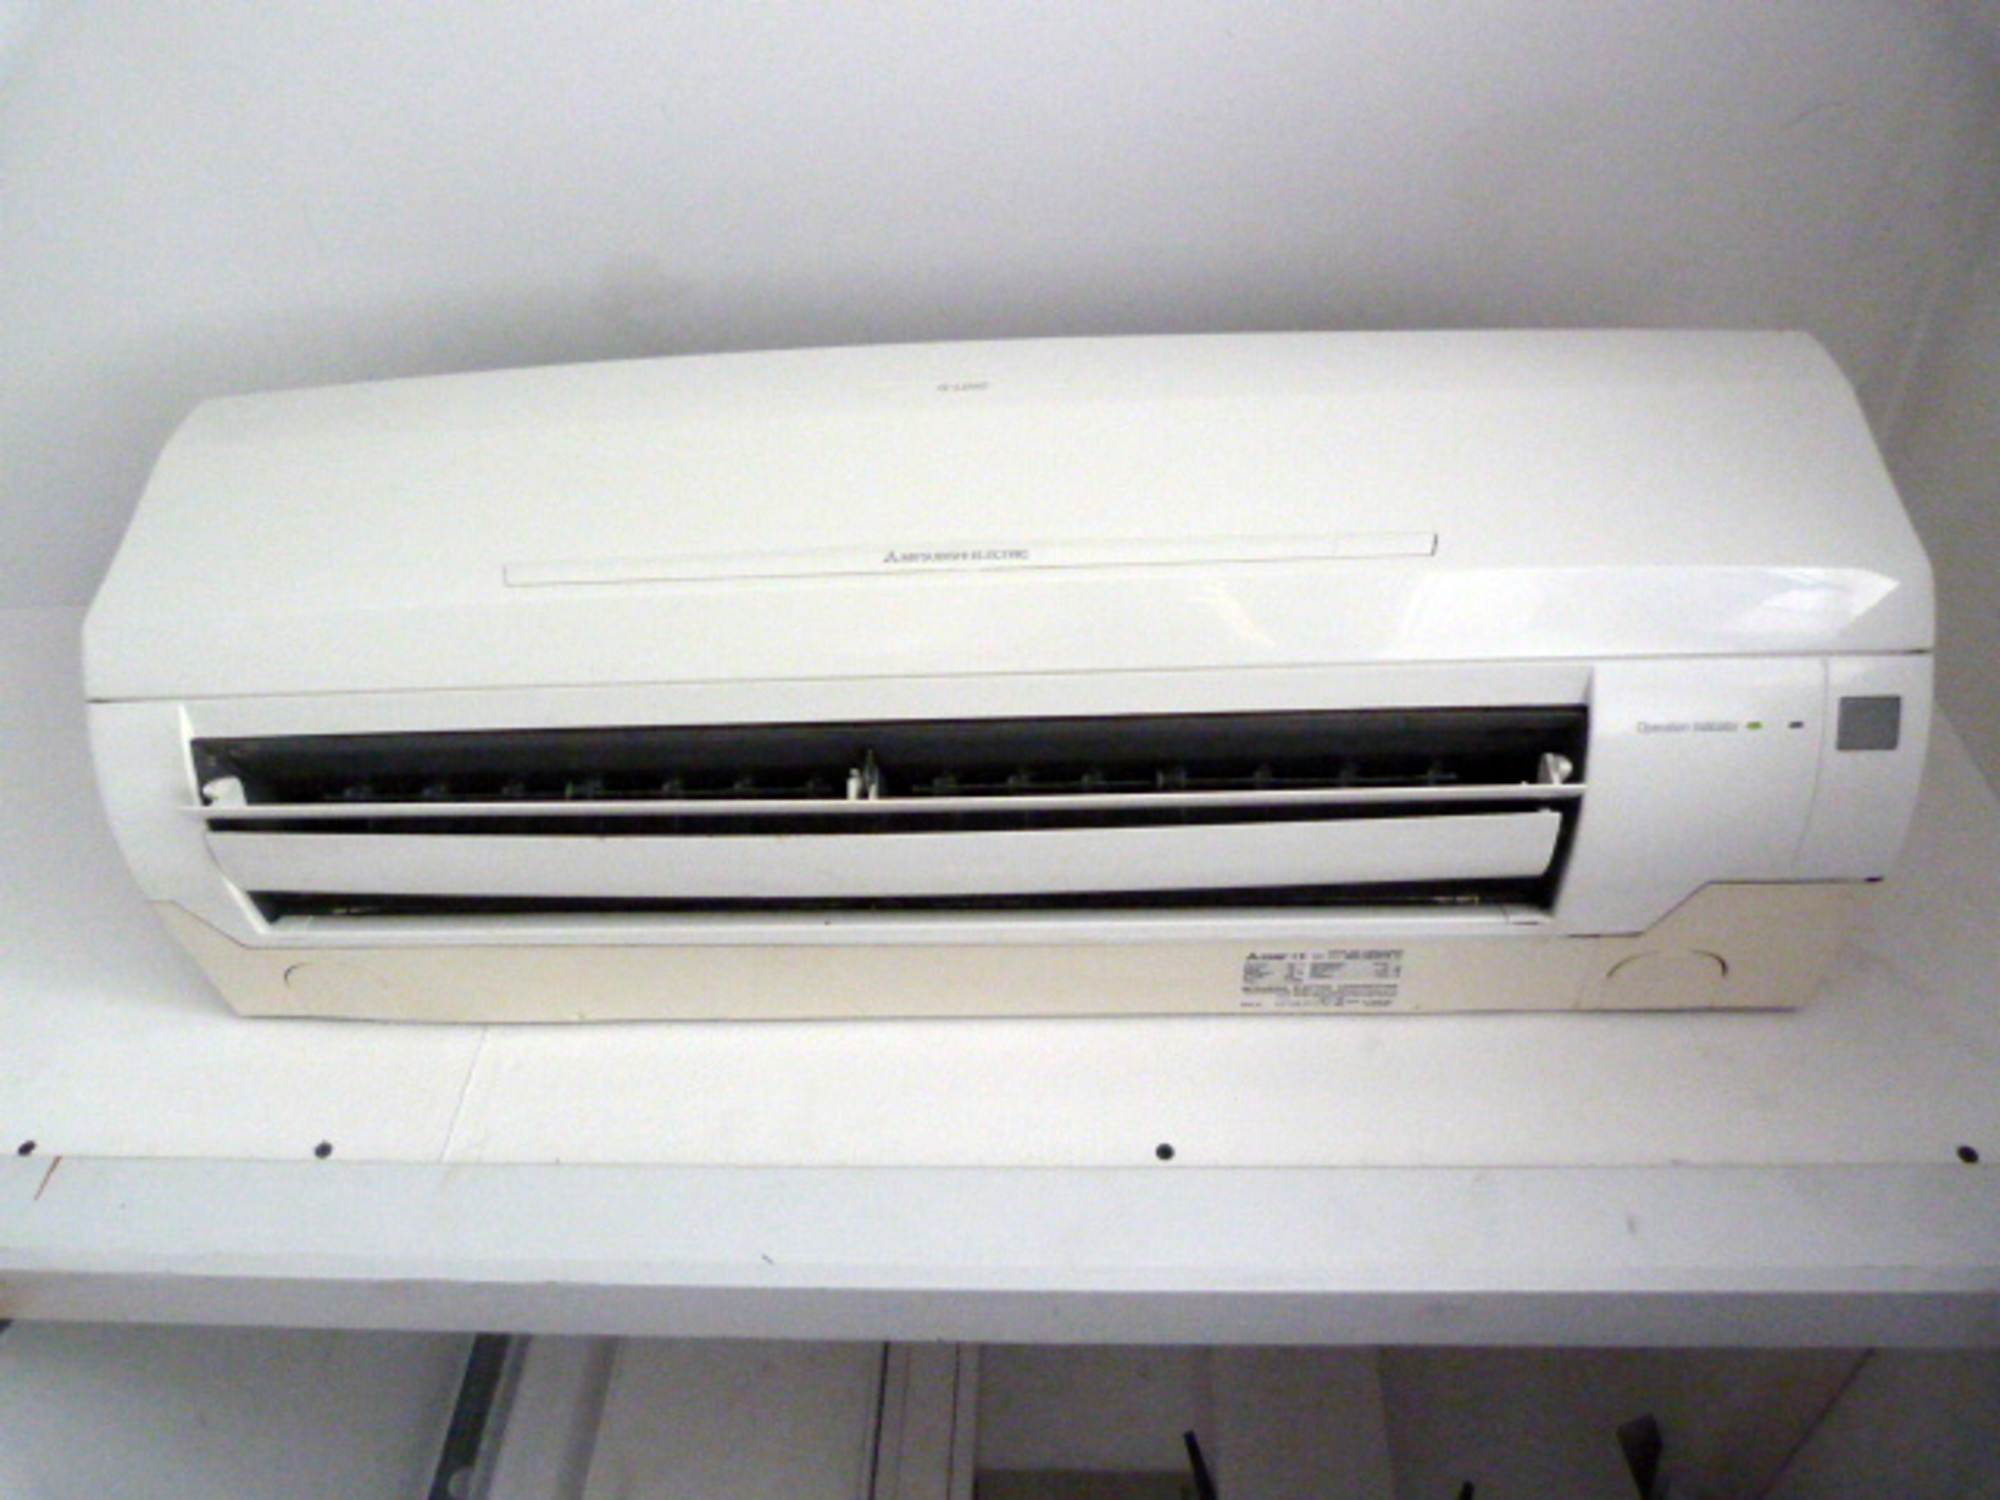 Pompe a chaleur air air mitsubishi electric mu ga35vb - Pompe a chaleur air air mitsubishi ...